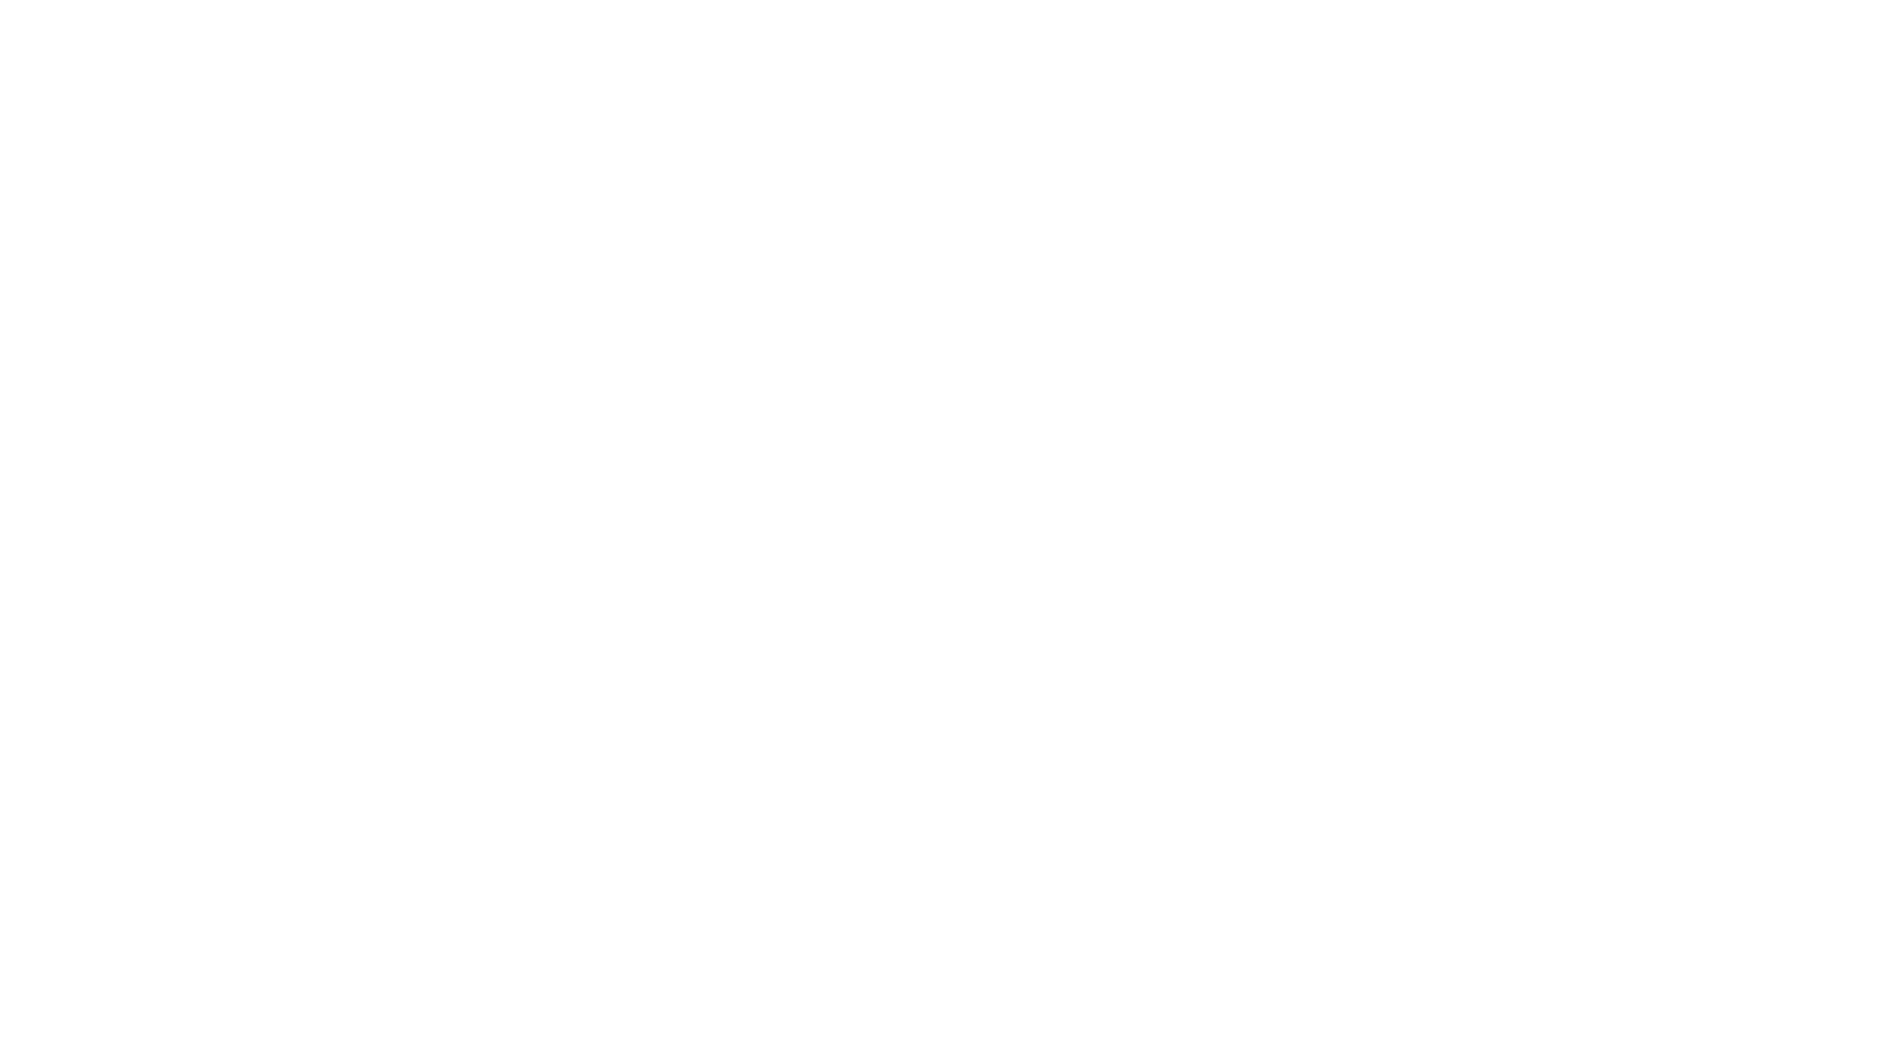 Logo-doc-16.png